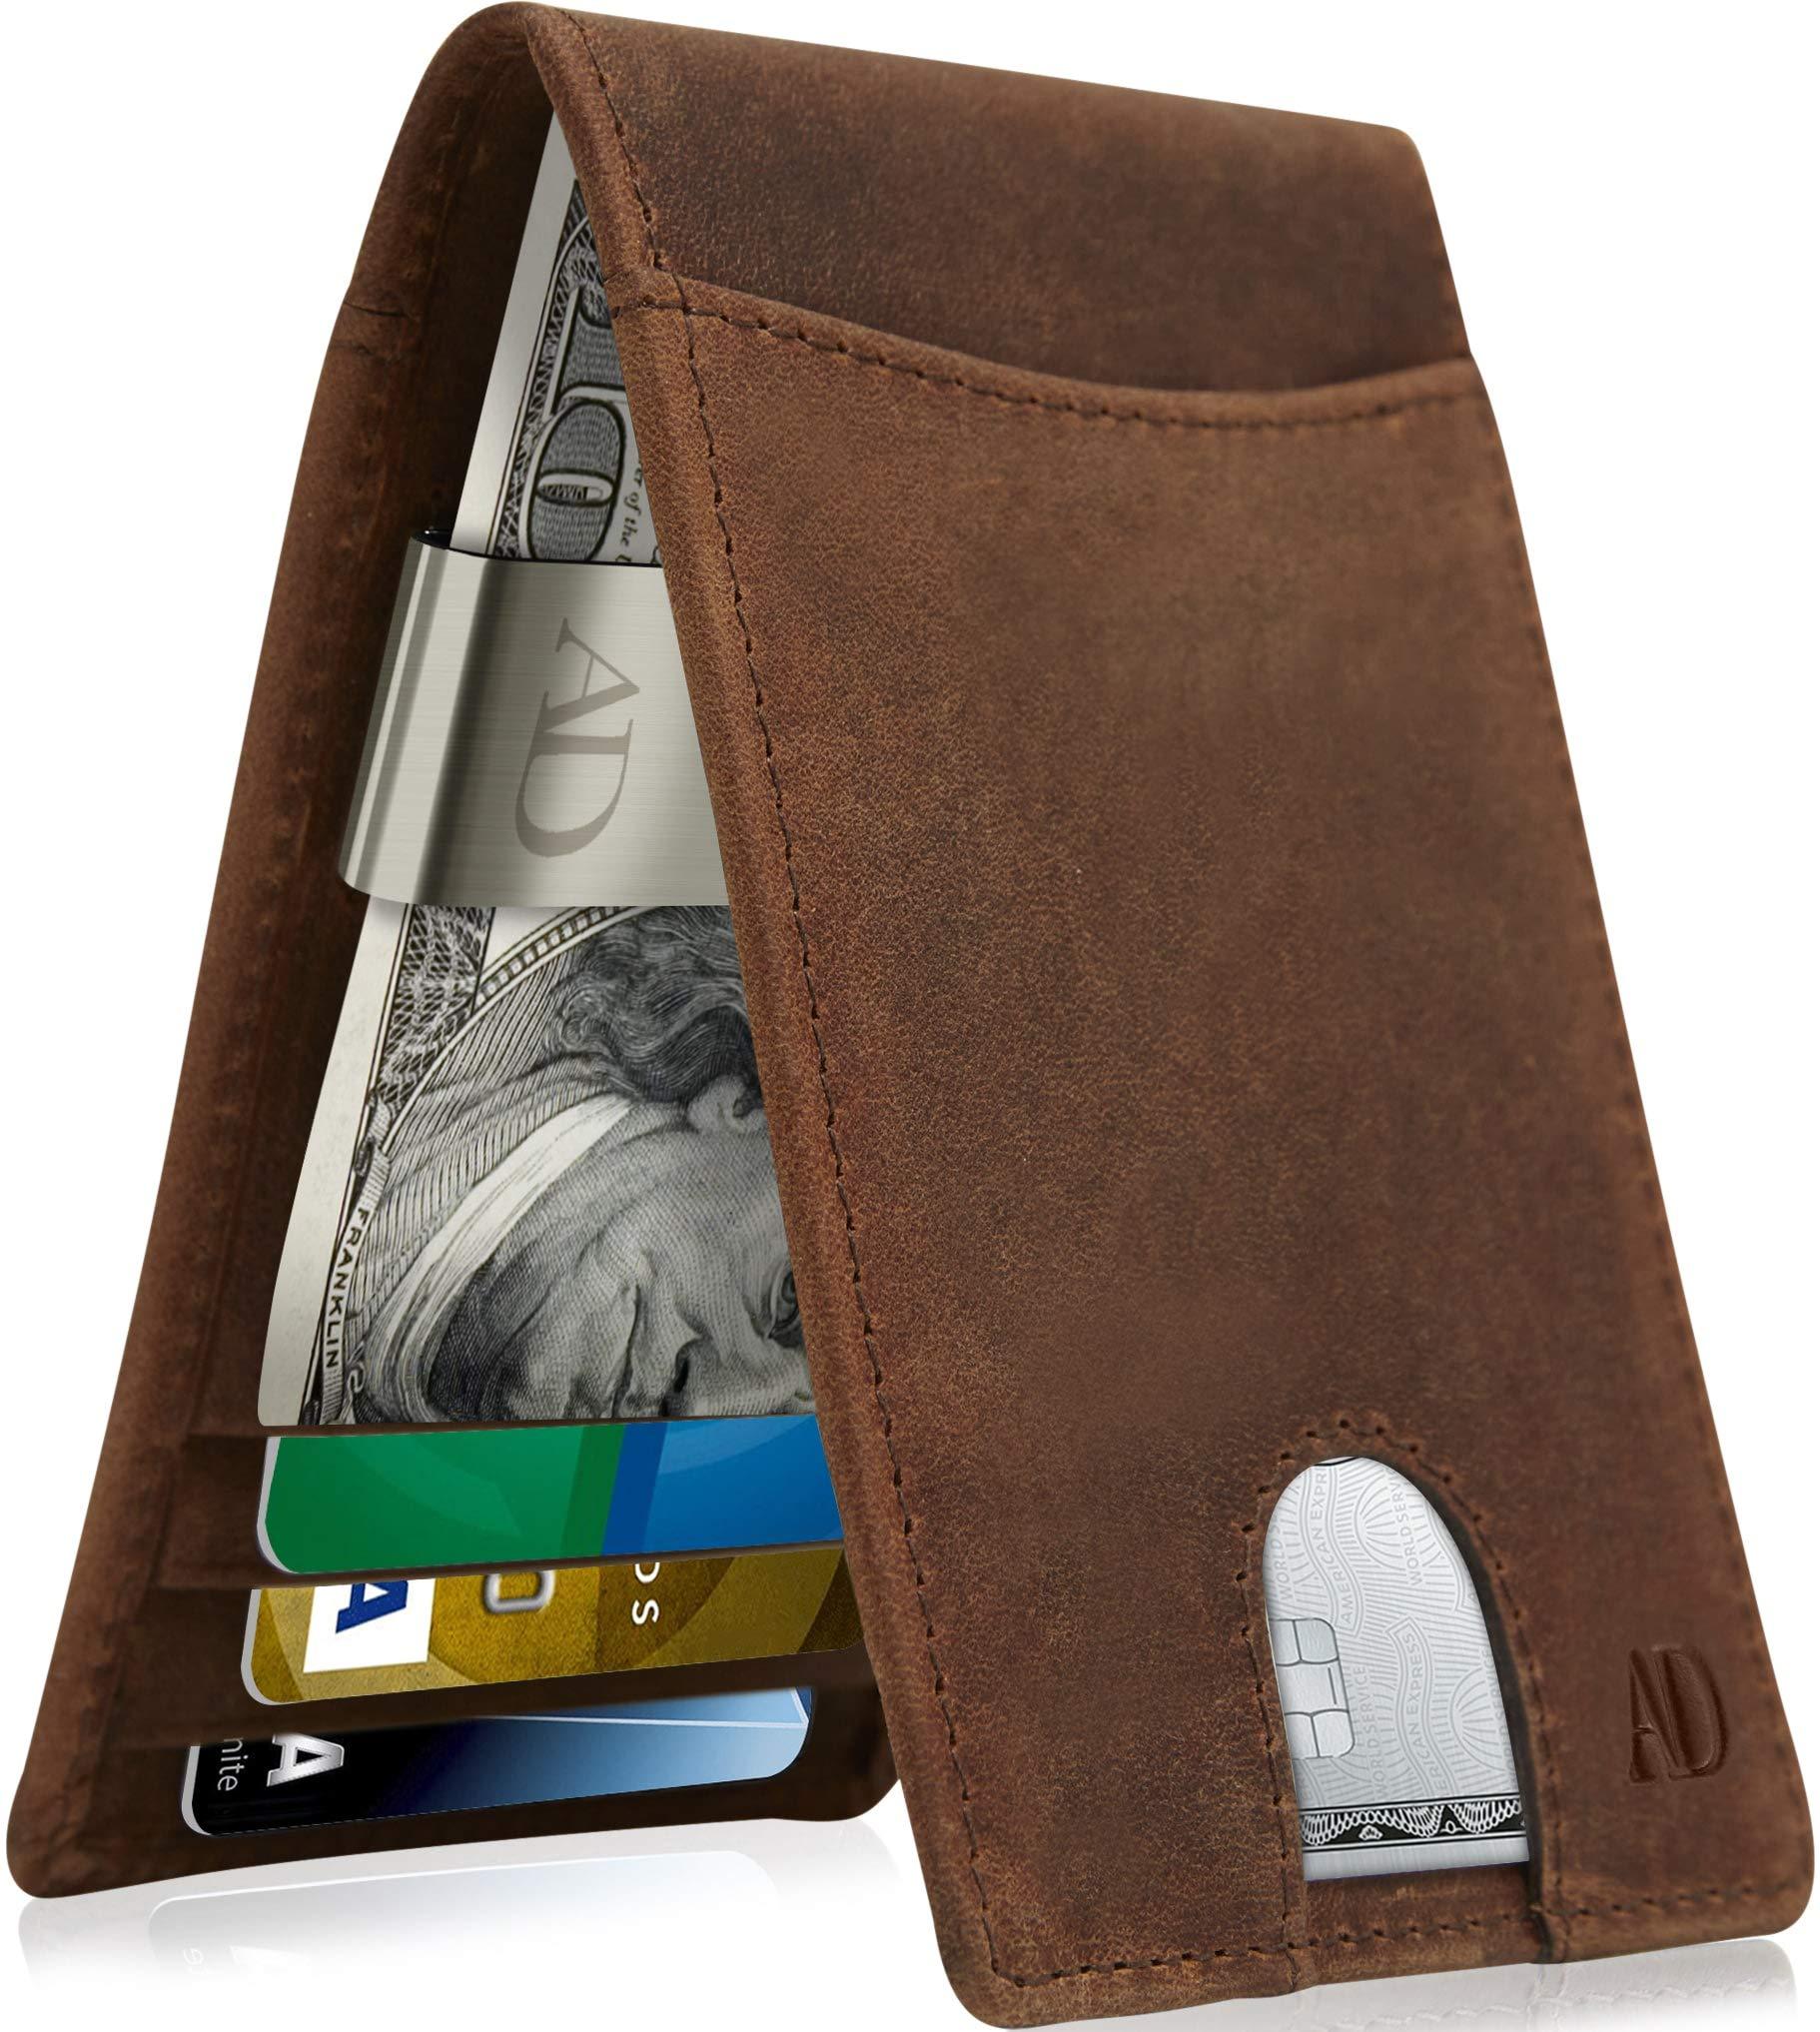 Slim Bifold Wallets For Men - Money Clip Wallet RFID Front Pocket Leather Thin Minimalist Mens Wallet Credit Card Holder